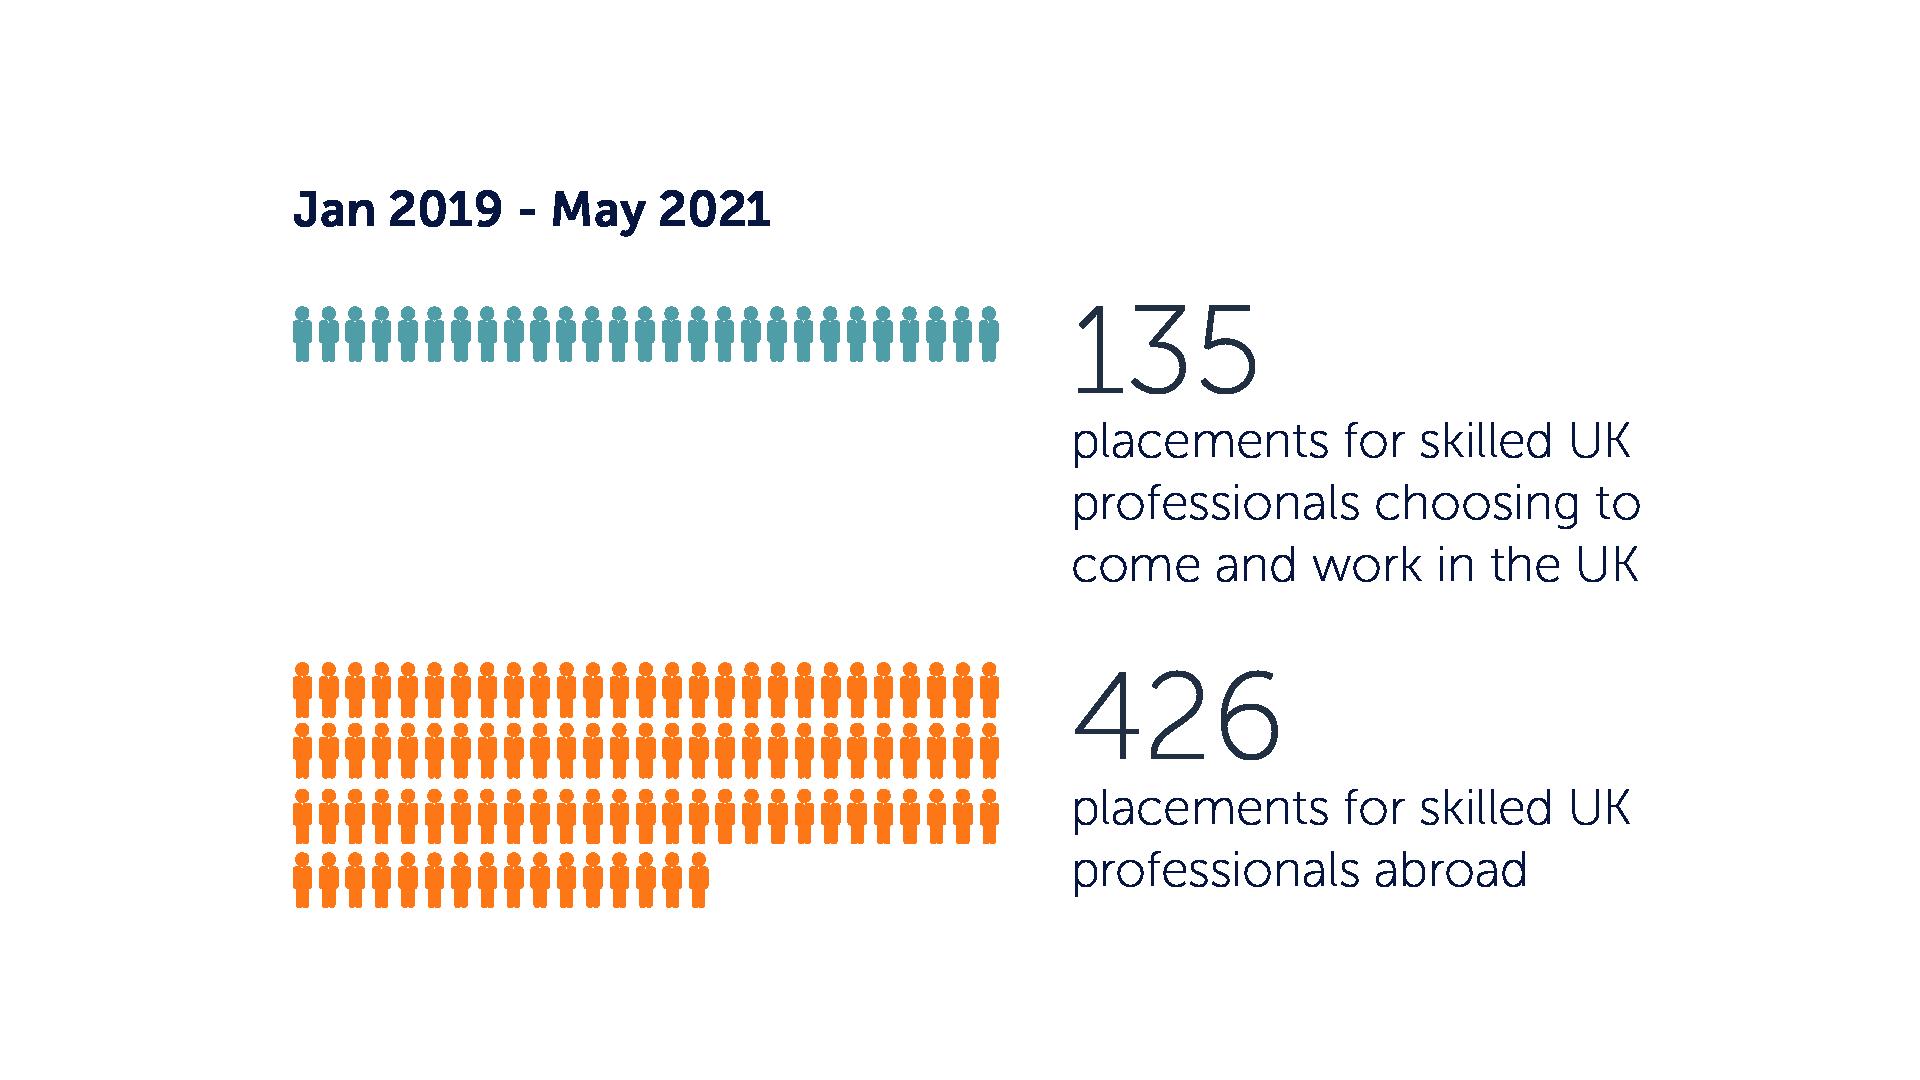 life sciences professionals leaving UK